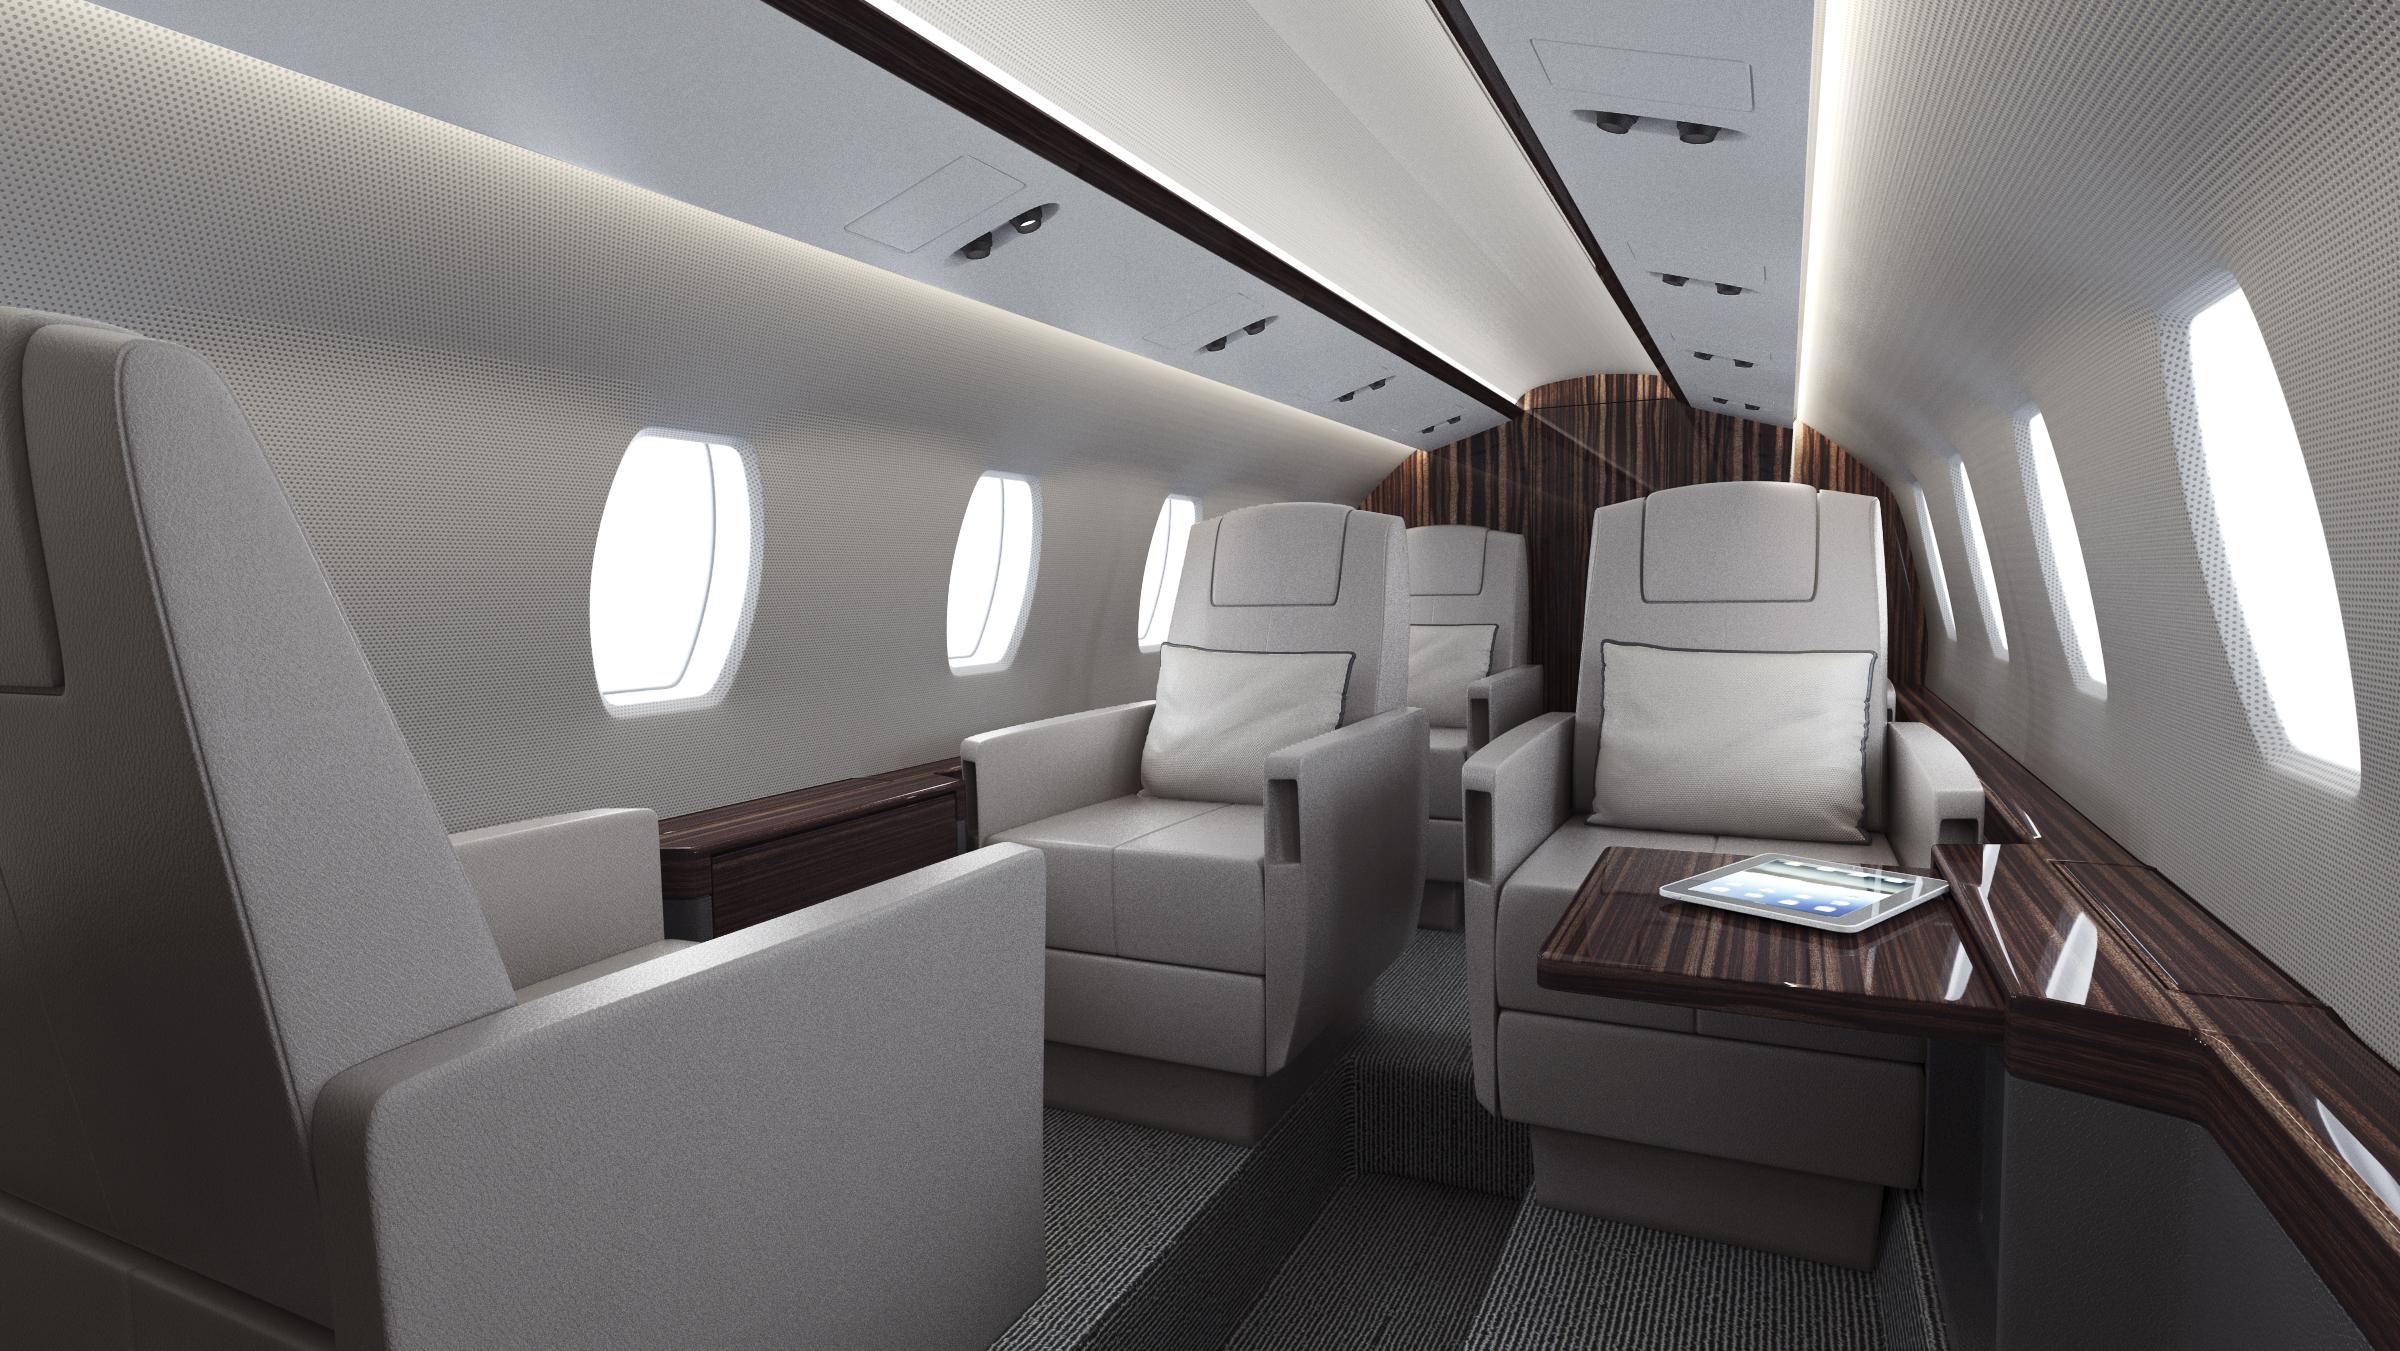 <b>Aviation</b>#View